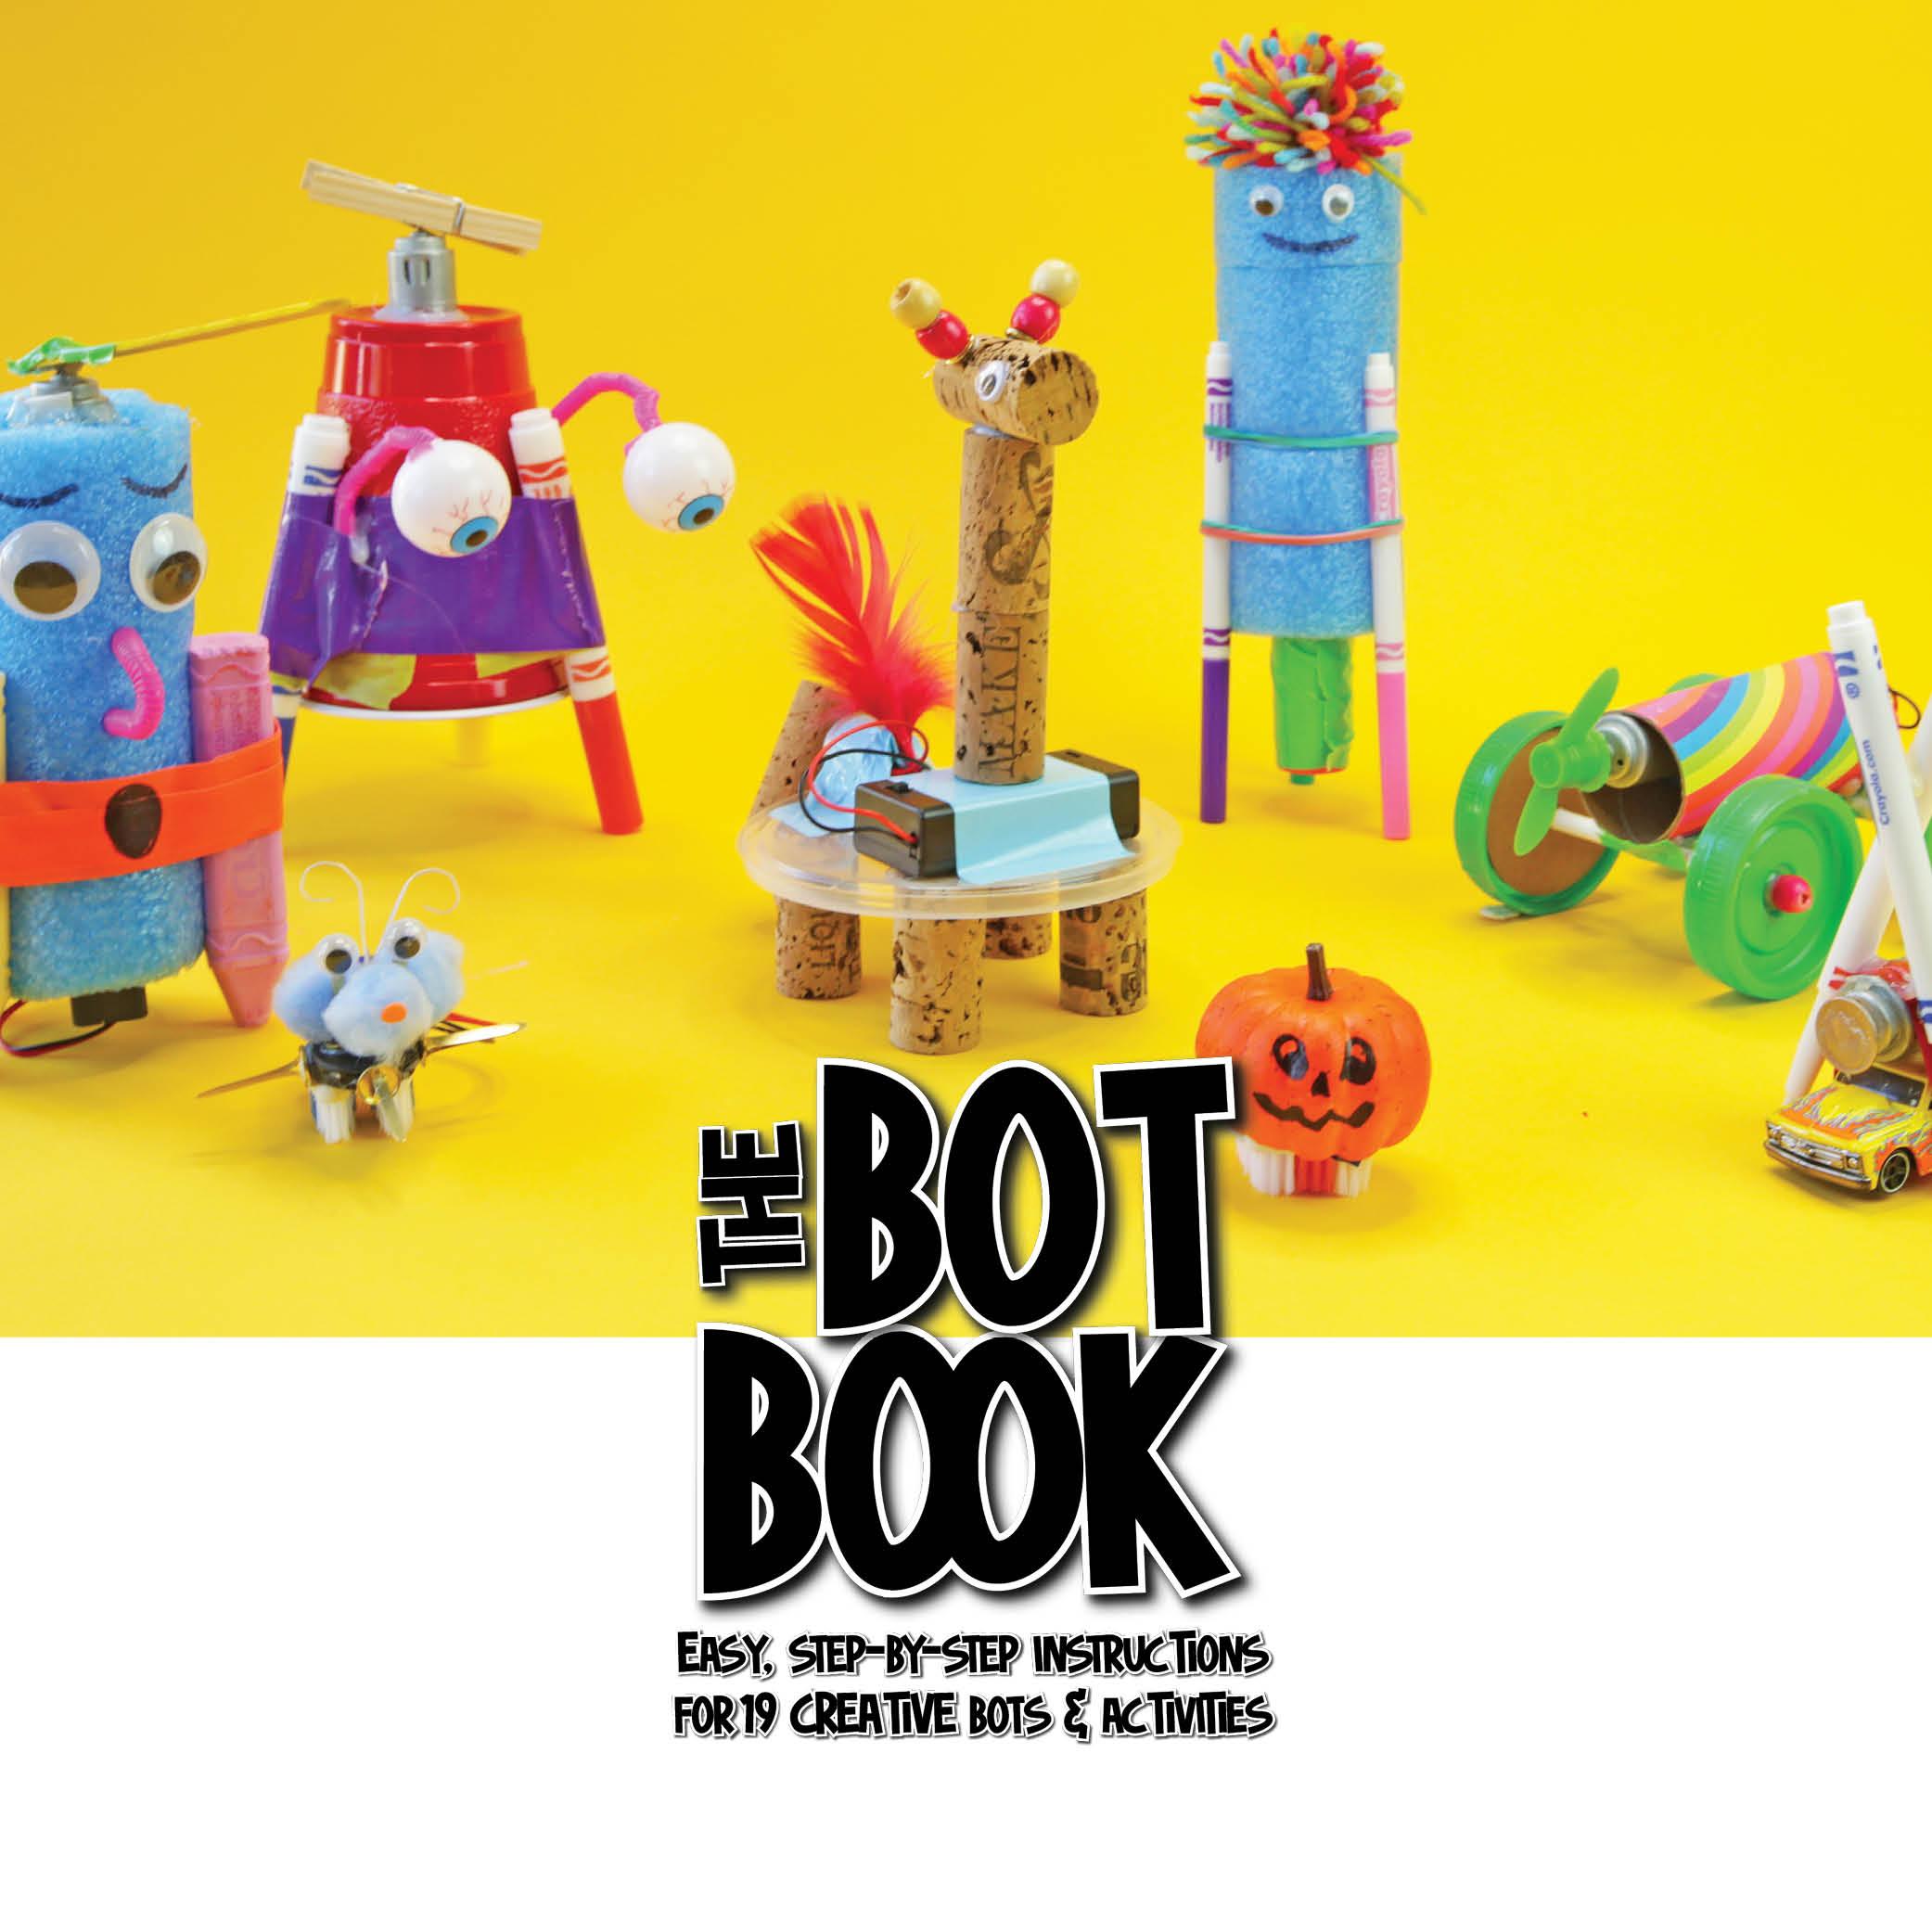 bot book header square